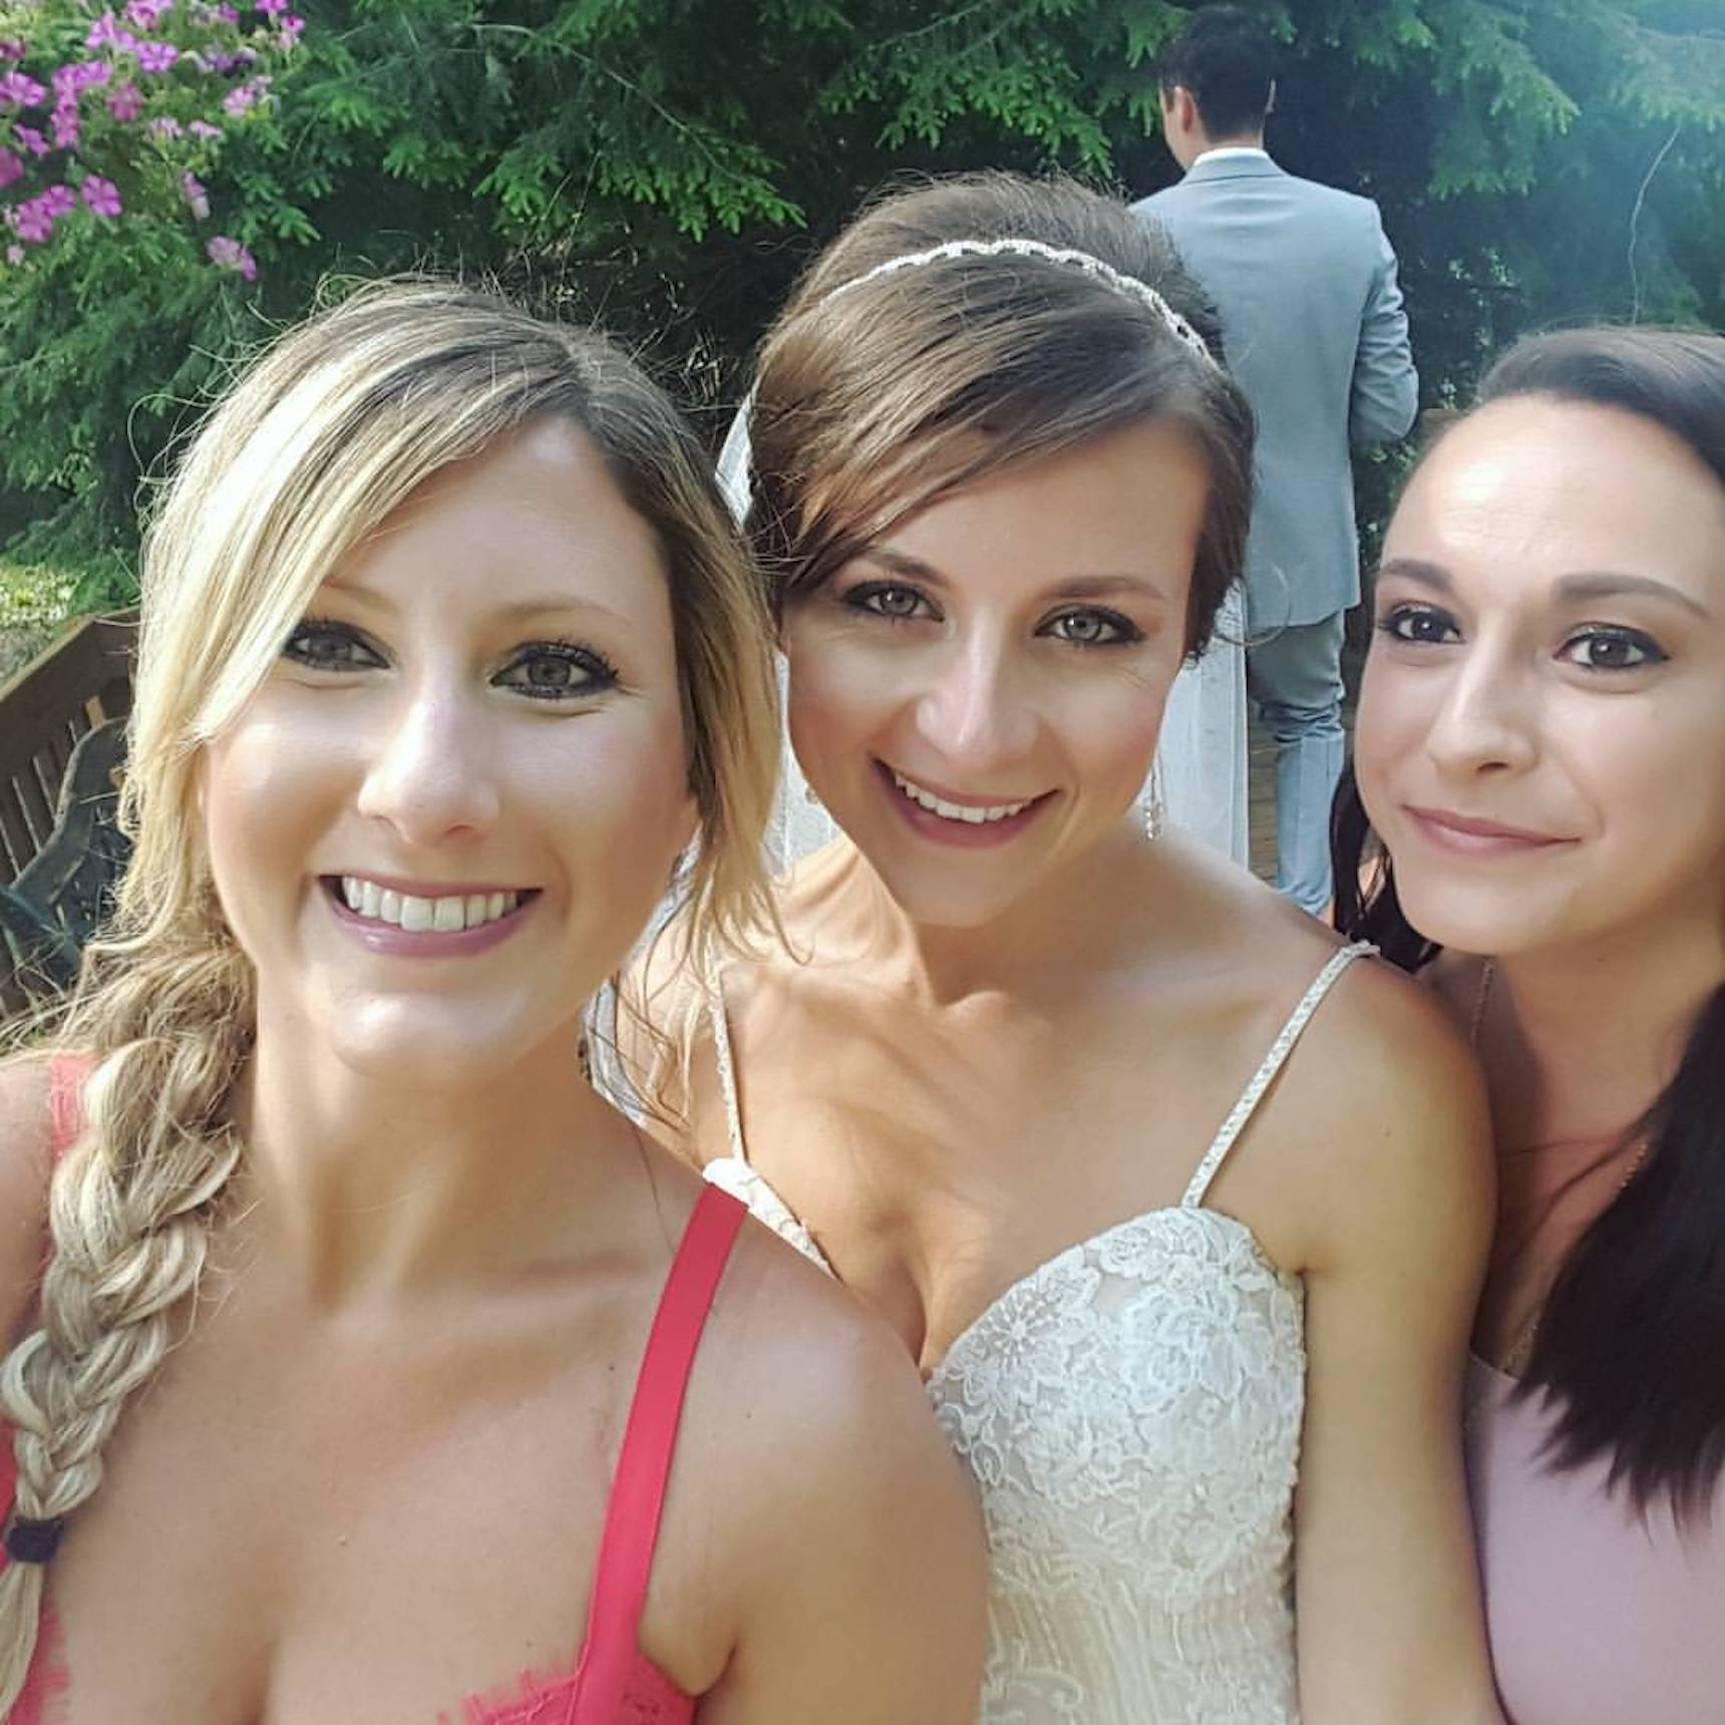 ashley-and-best-friends_meet-updater-ashley-jucha.jpg